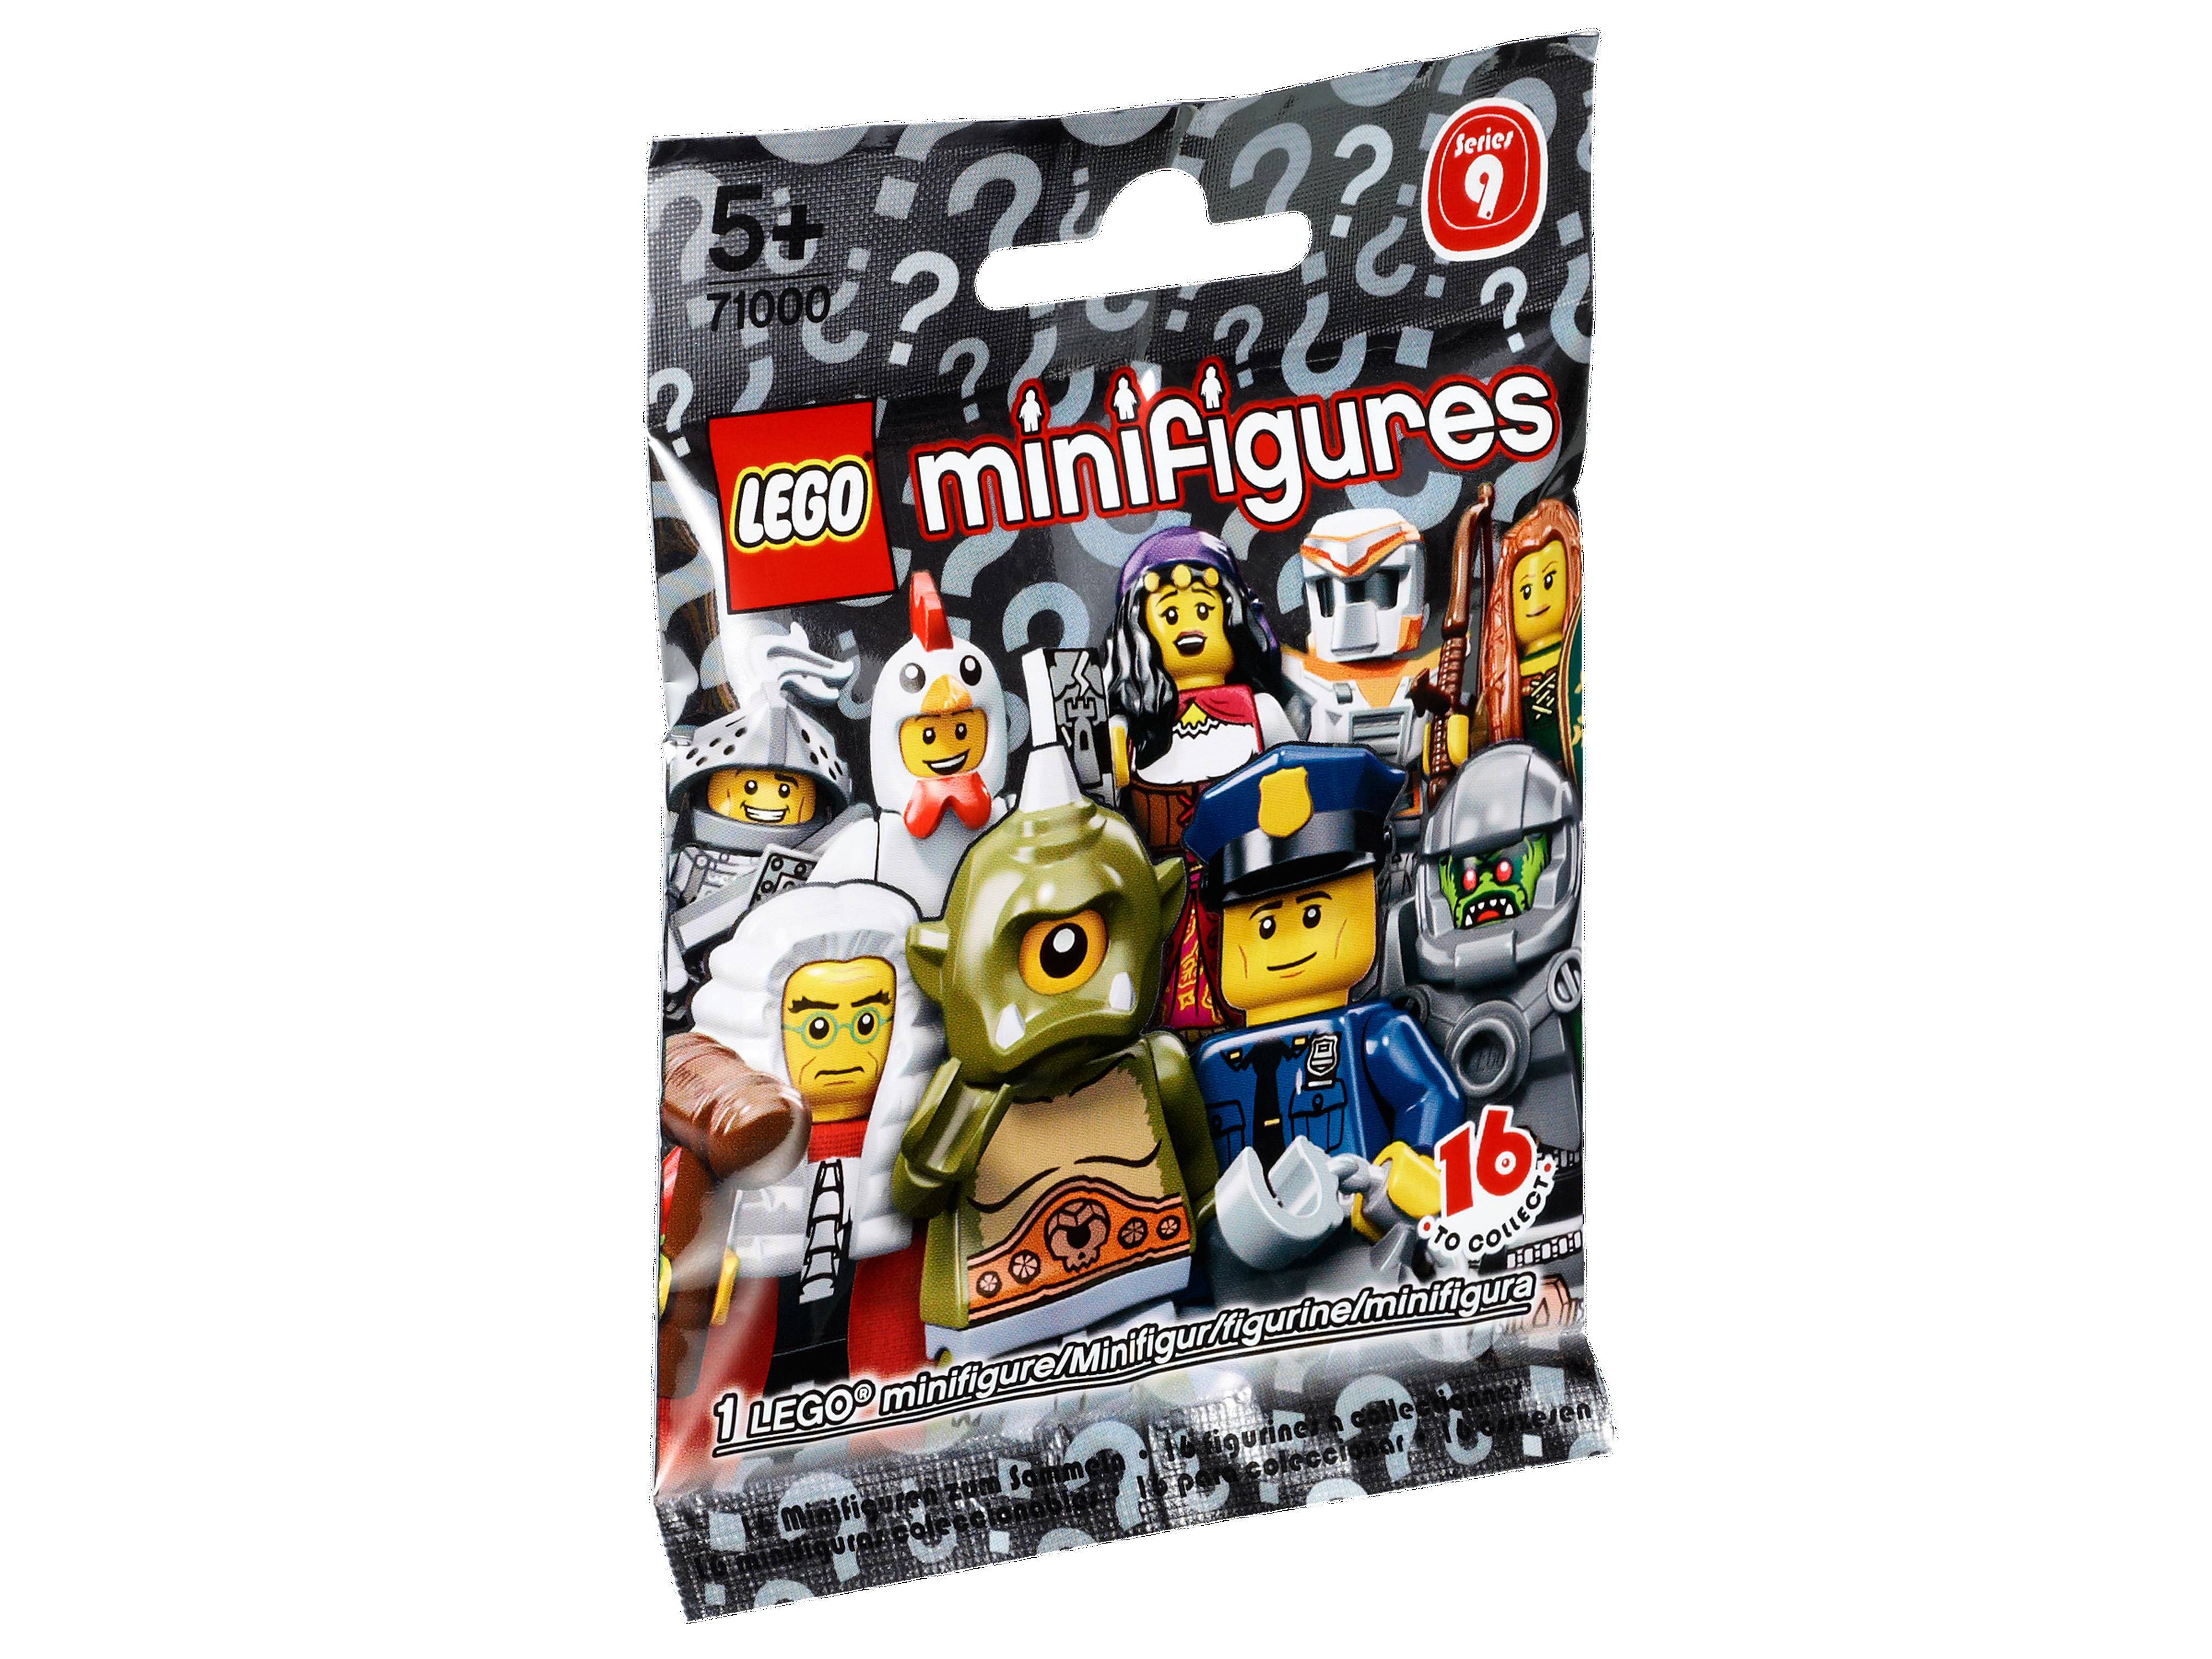 LEGO Minifigures Série 9-Cyclope, 71000 complet